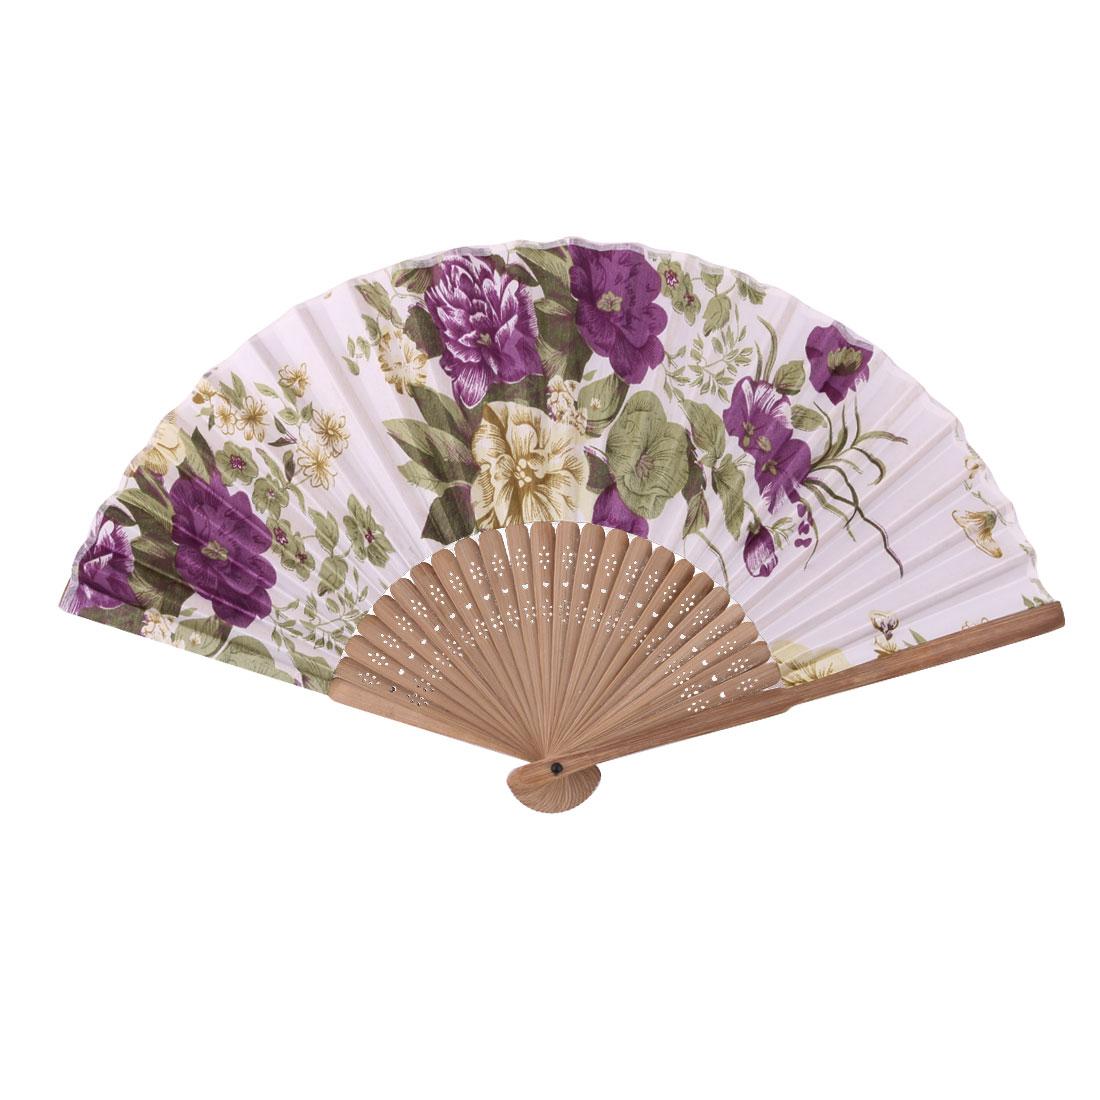 Wedding Party Bamboo Frame Flower Print Decorative Craft Folding Hand Fan Purple